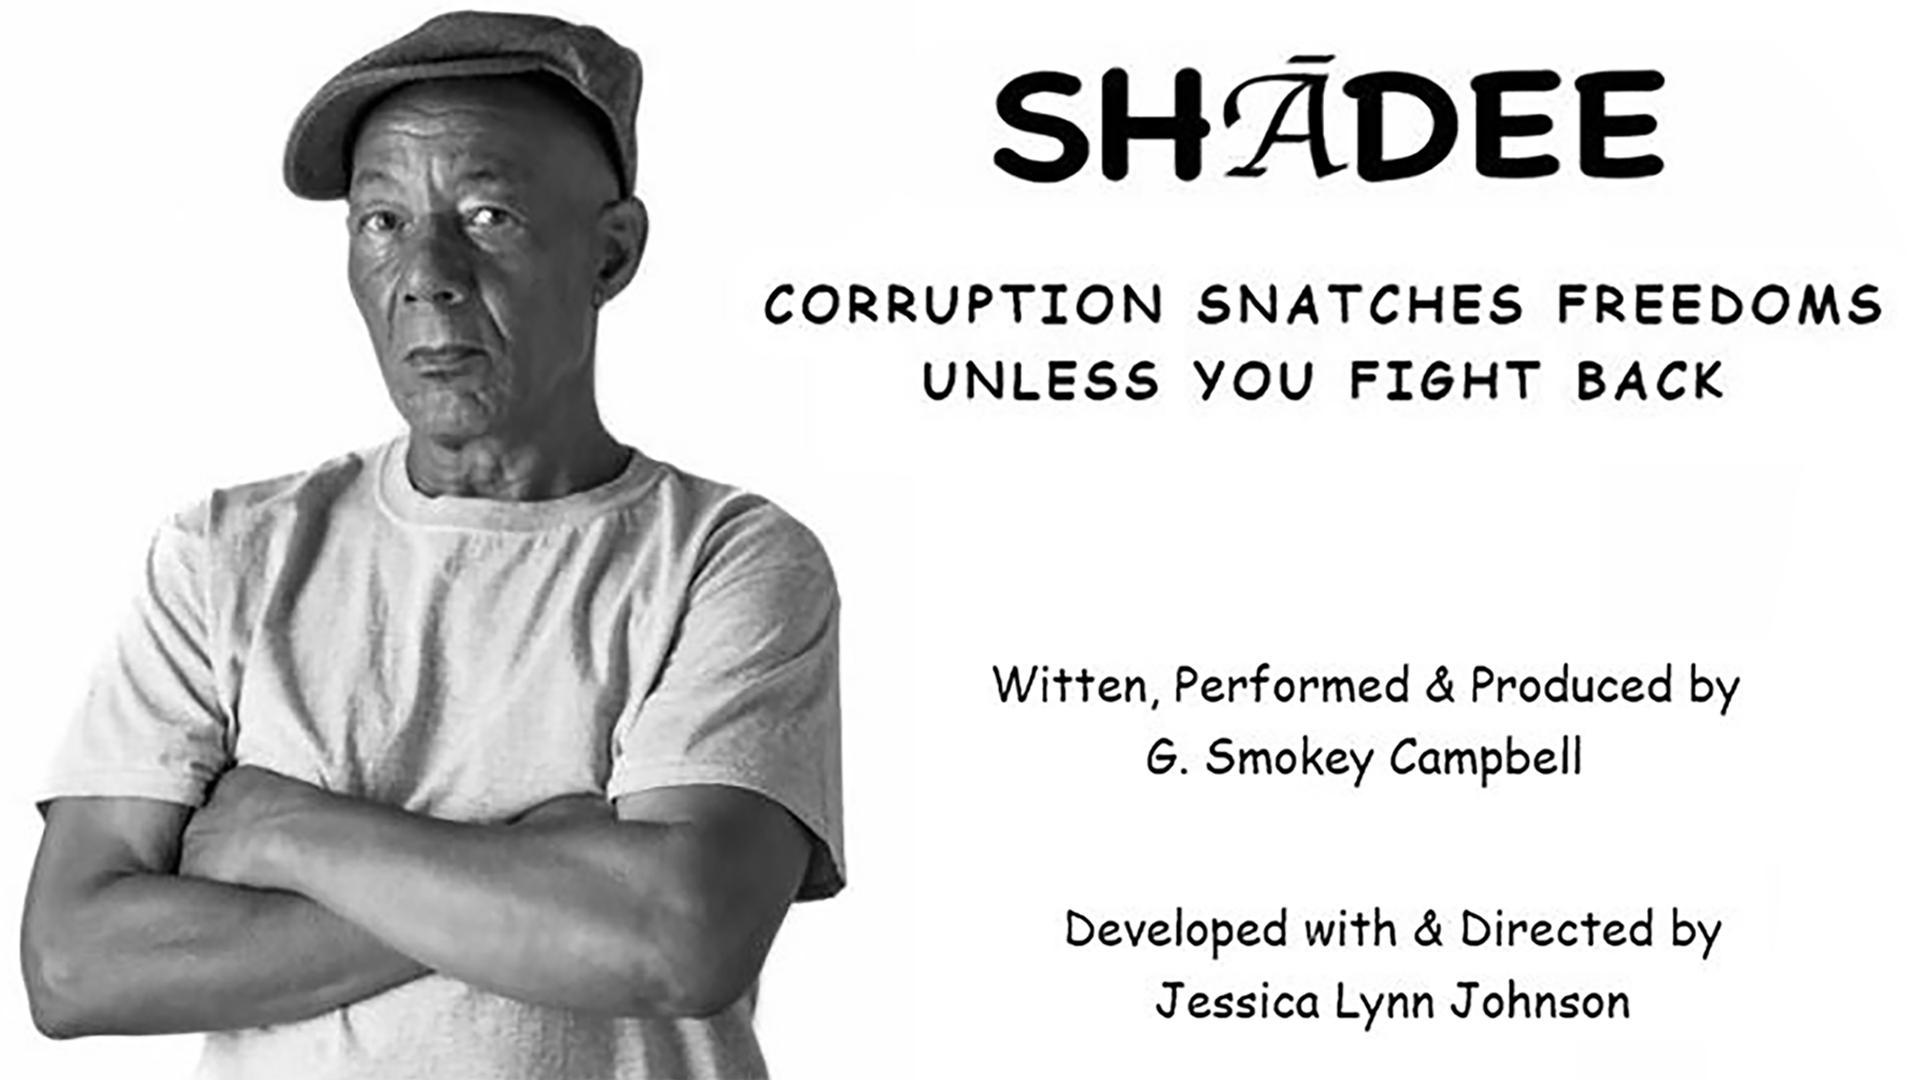 SHADEE Feb 15  @ 7pm PST